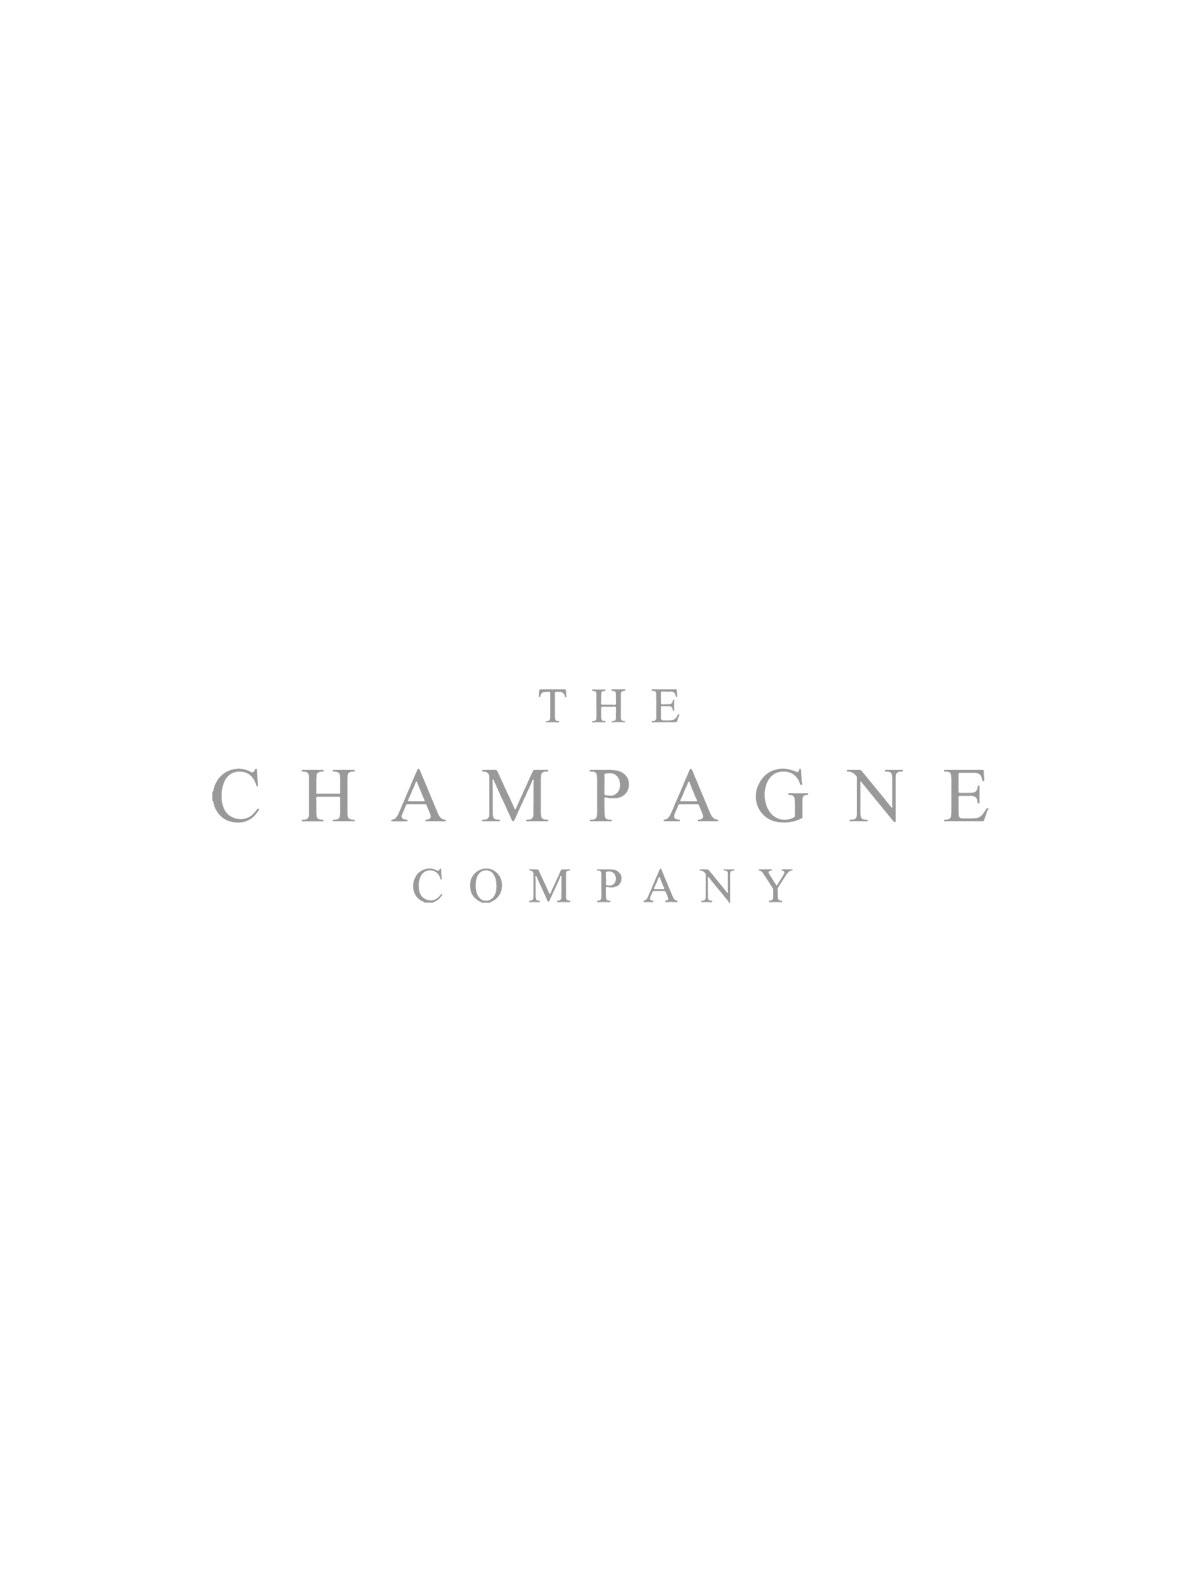 Boekenhoutskloof Chocolate Block Wine 75cl & Dark Truffles 135g